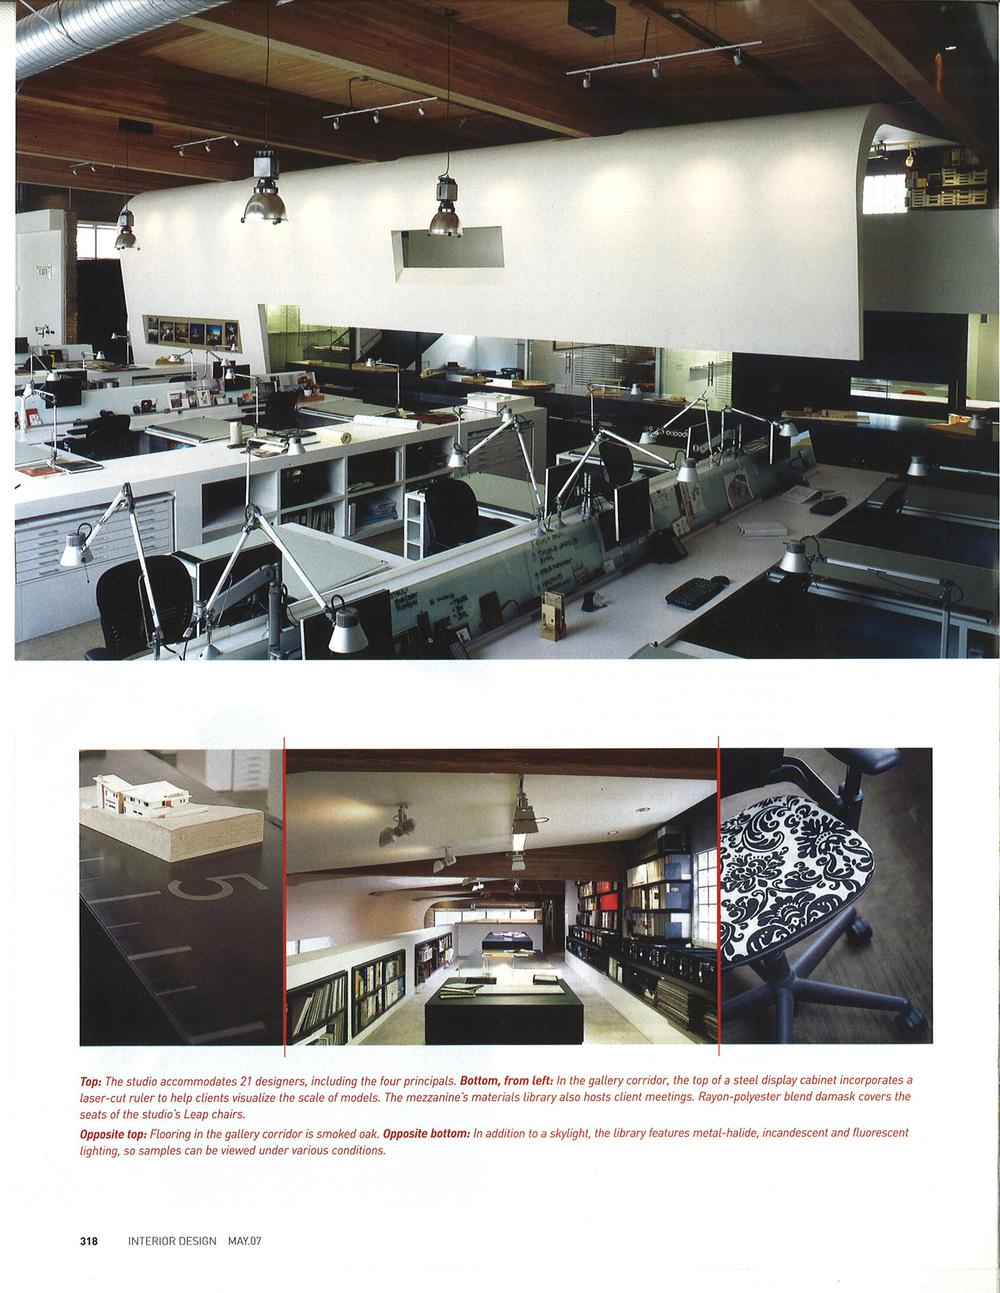 Interior Design-page4.jpg